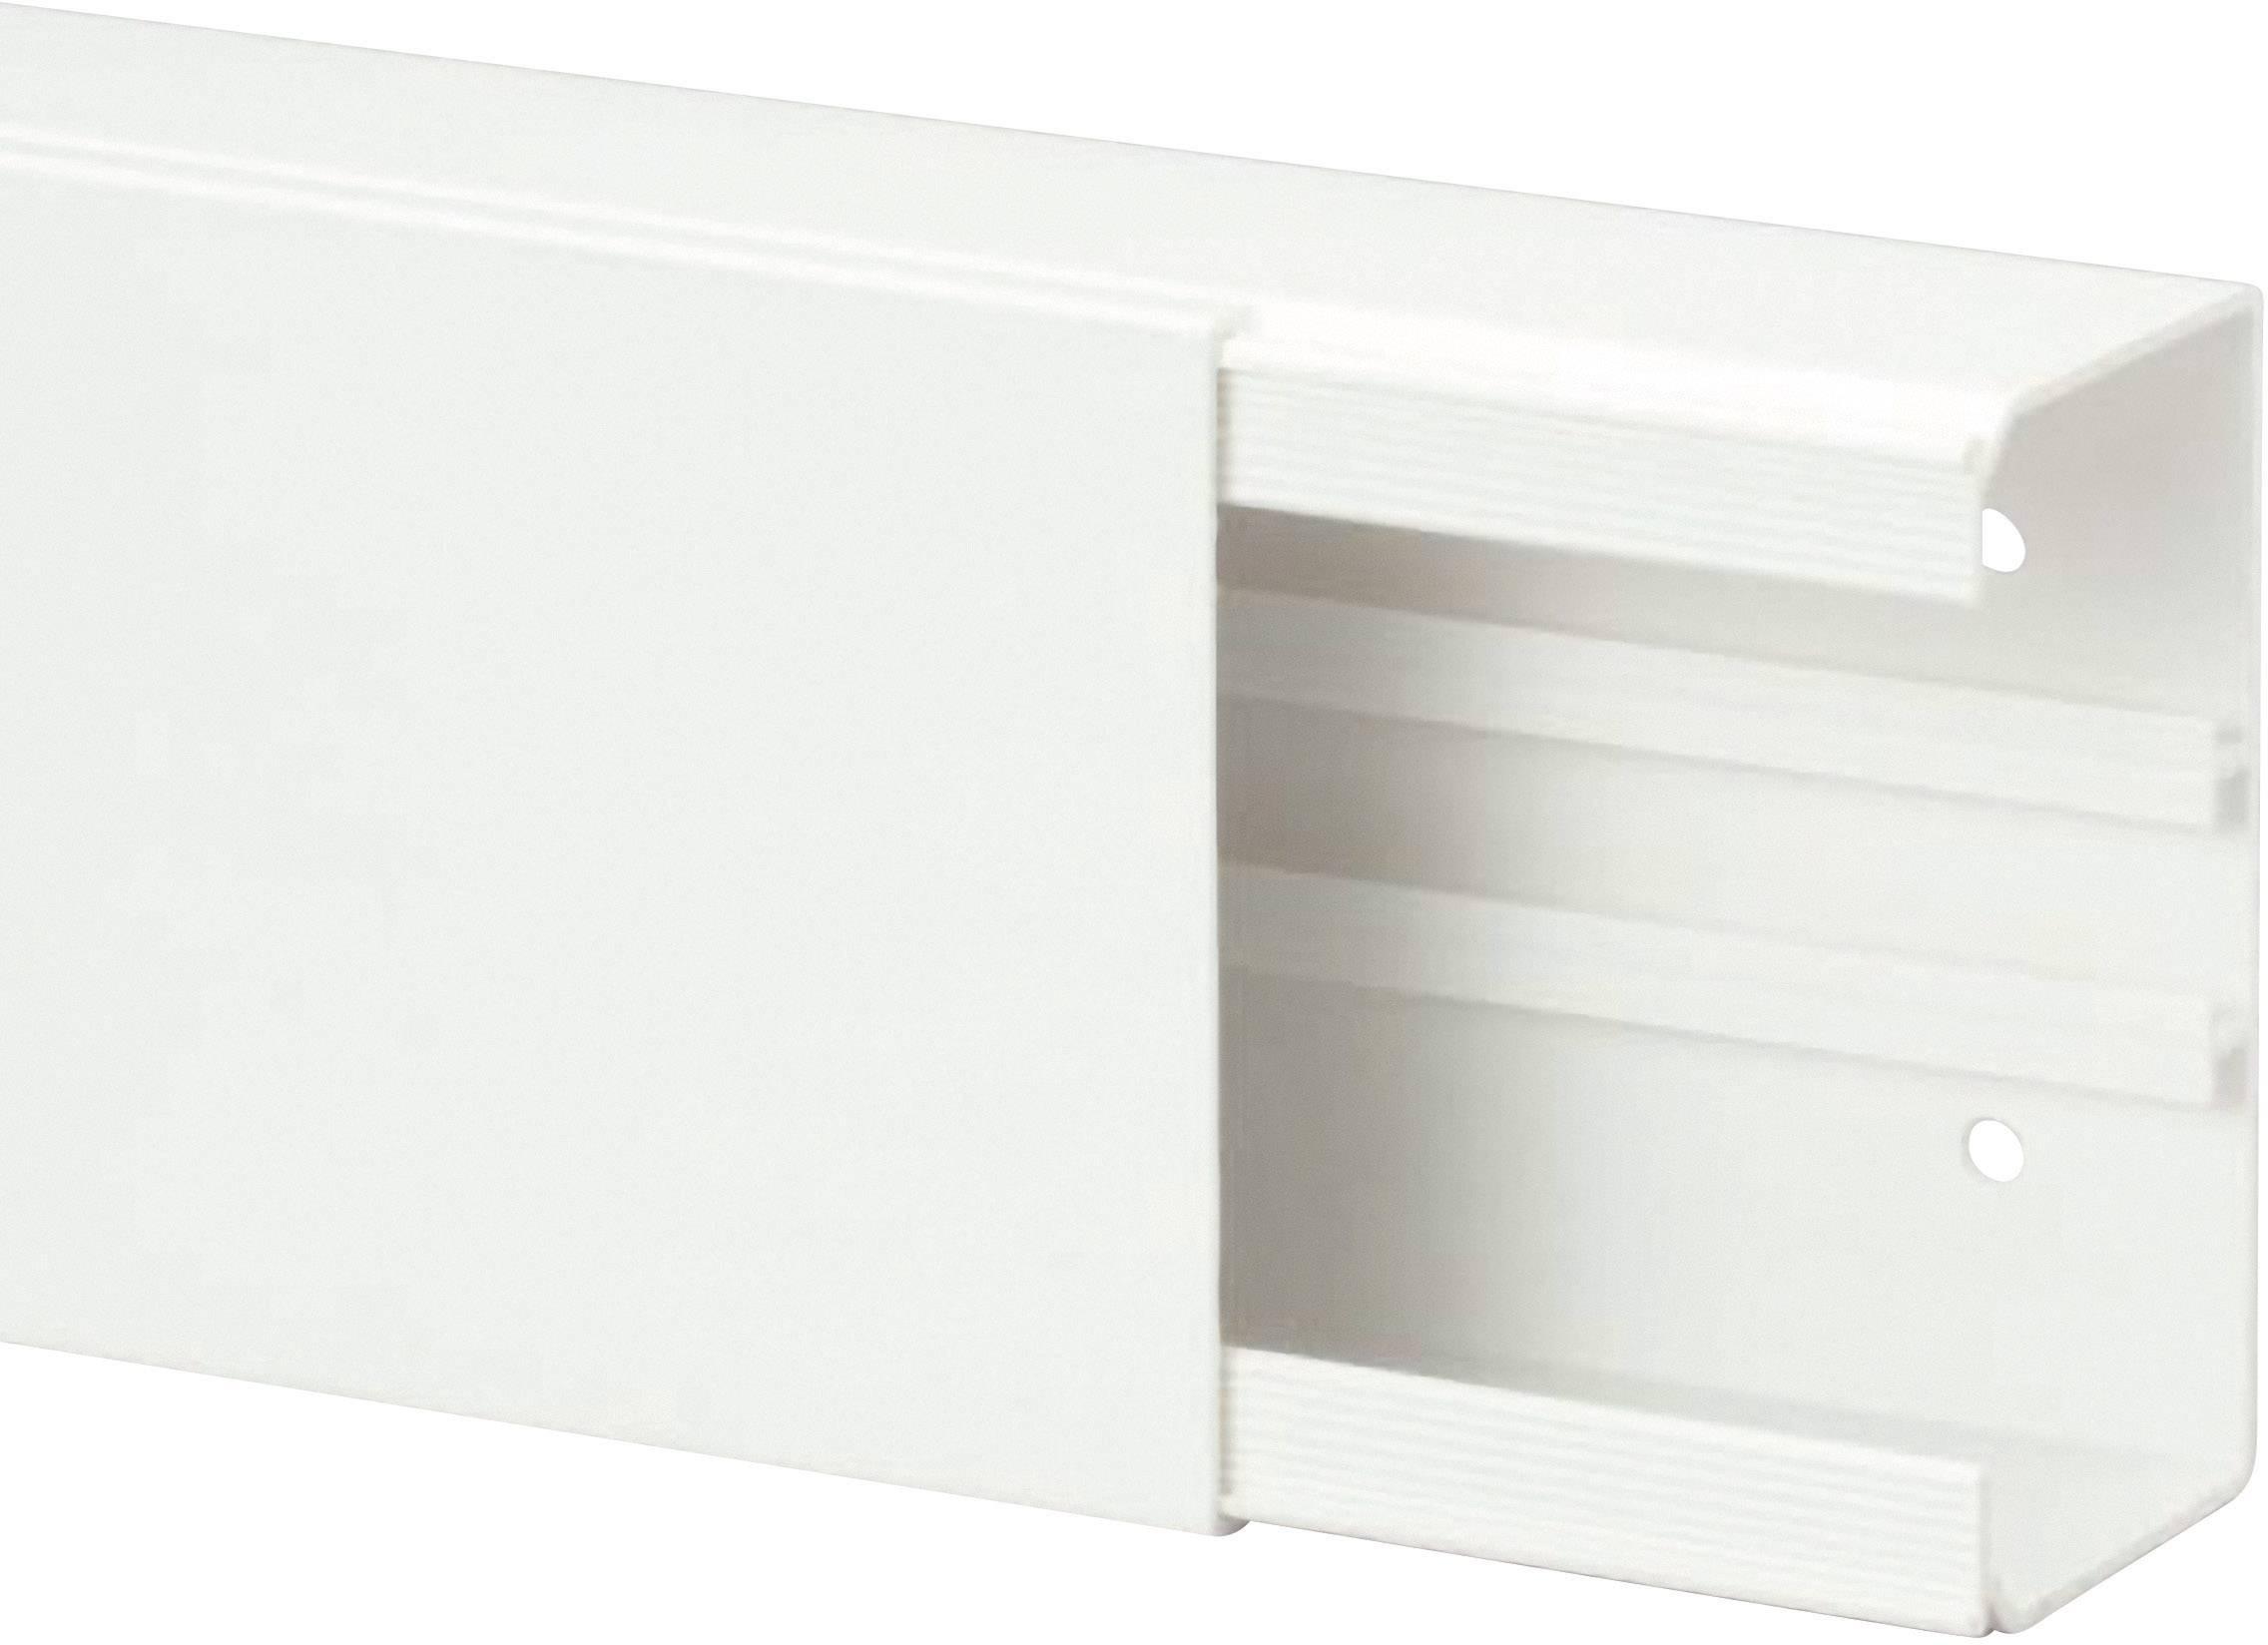 Káblová lišta Heidemann 09996, 1 ks, čisto biela